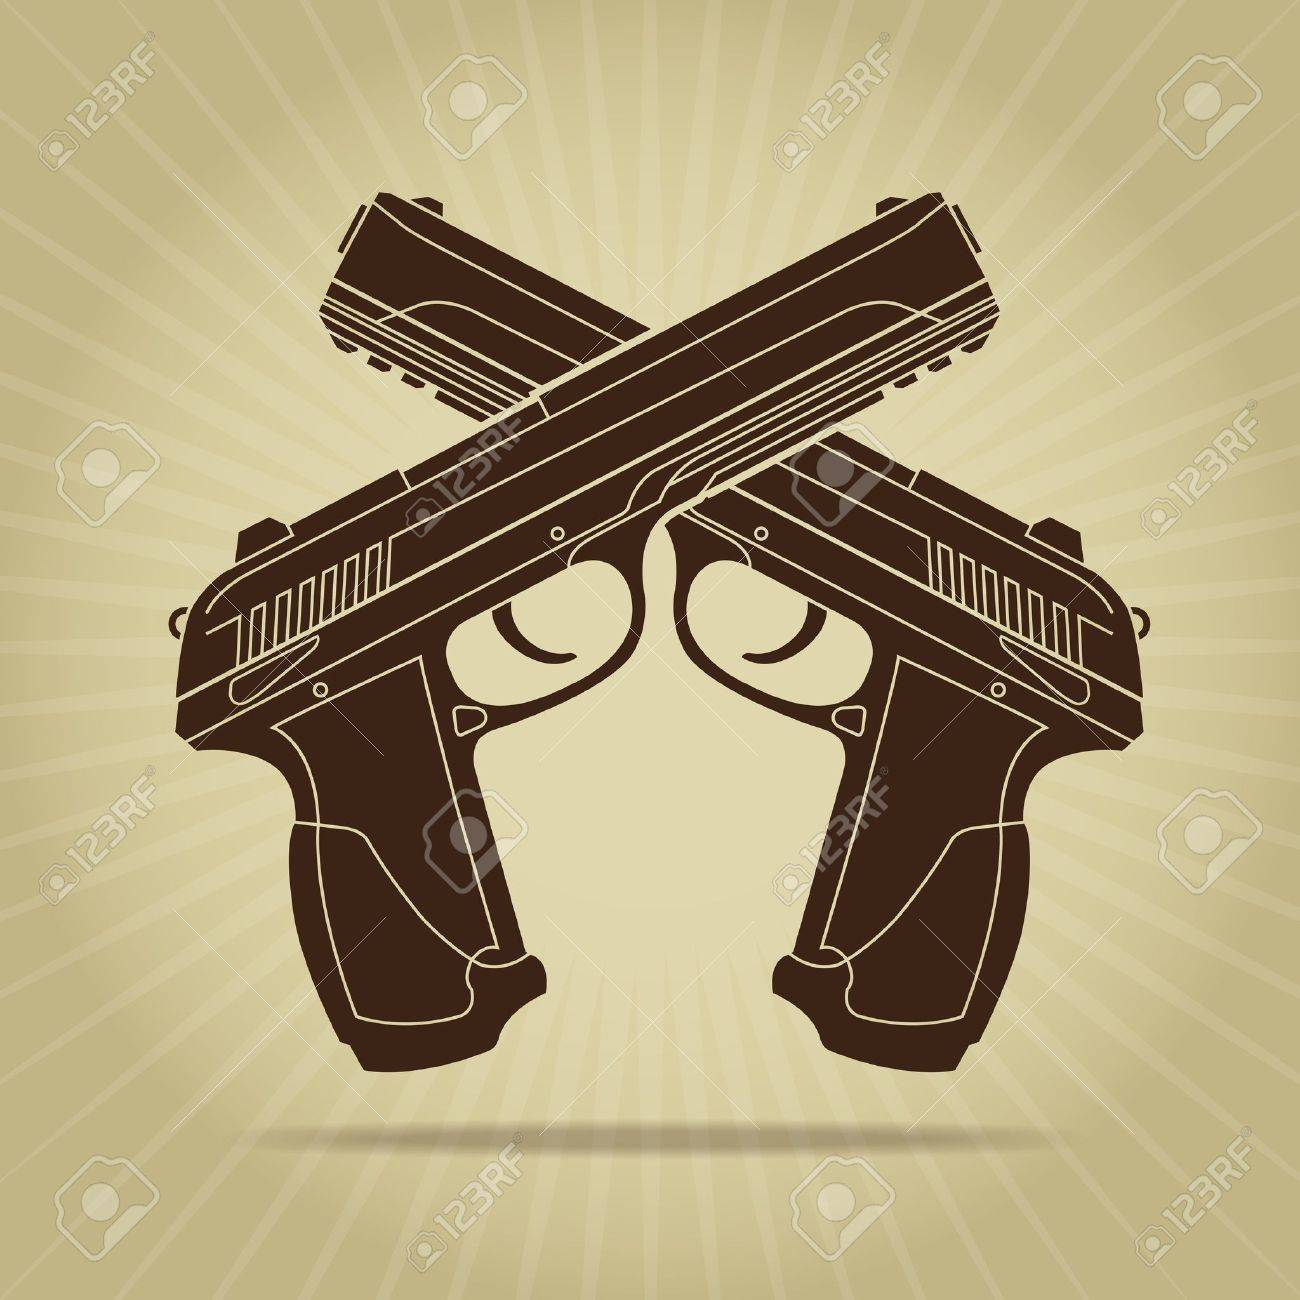 Retro Styled Crossed Pistols Silhouette Stock Vector - 18095702